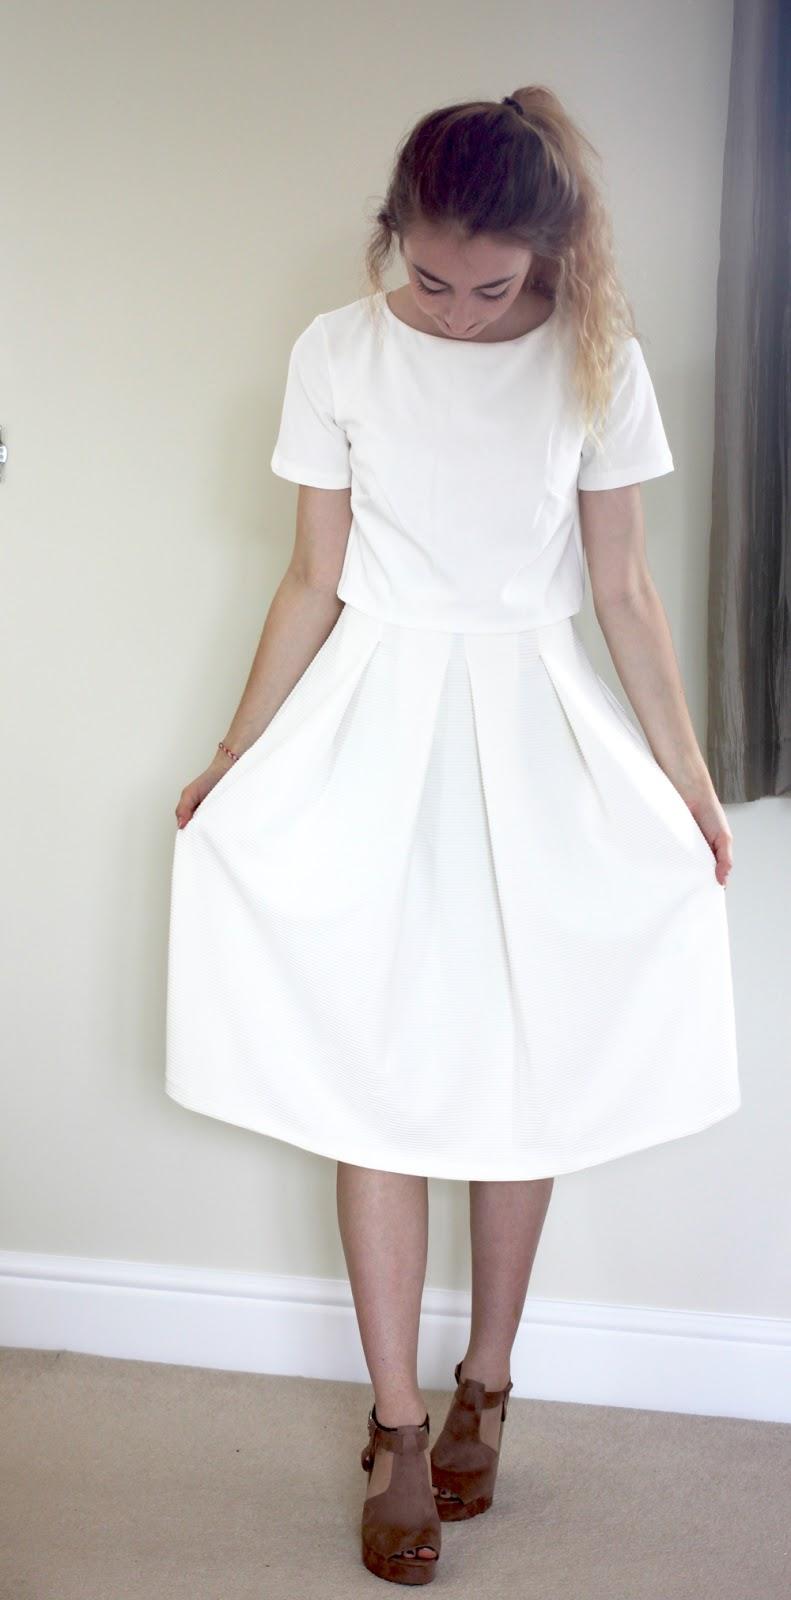 Summer Formal Outfits | www.hannahemilylane.com